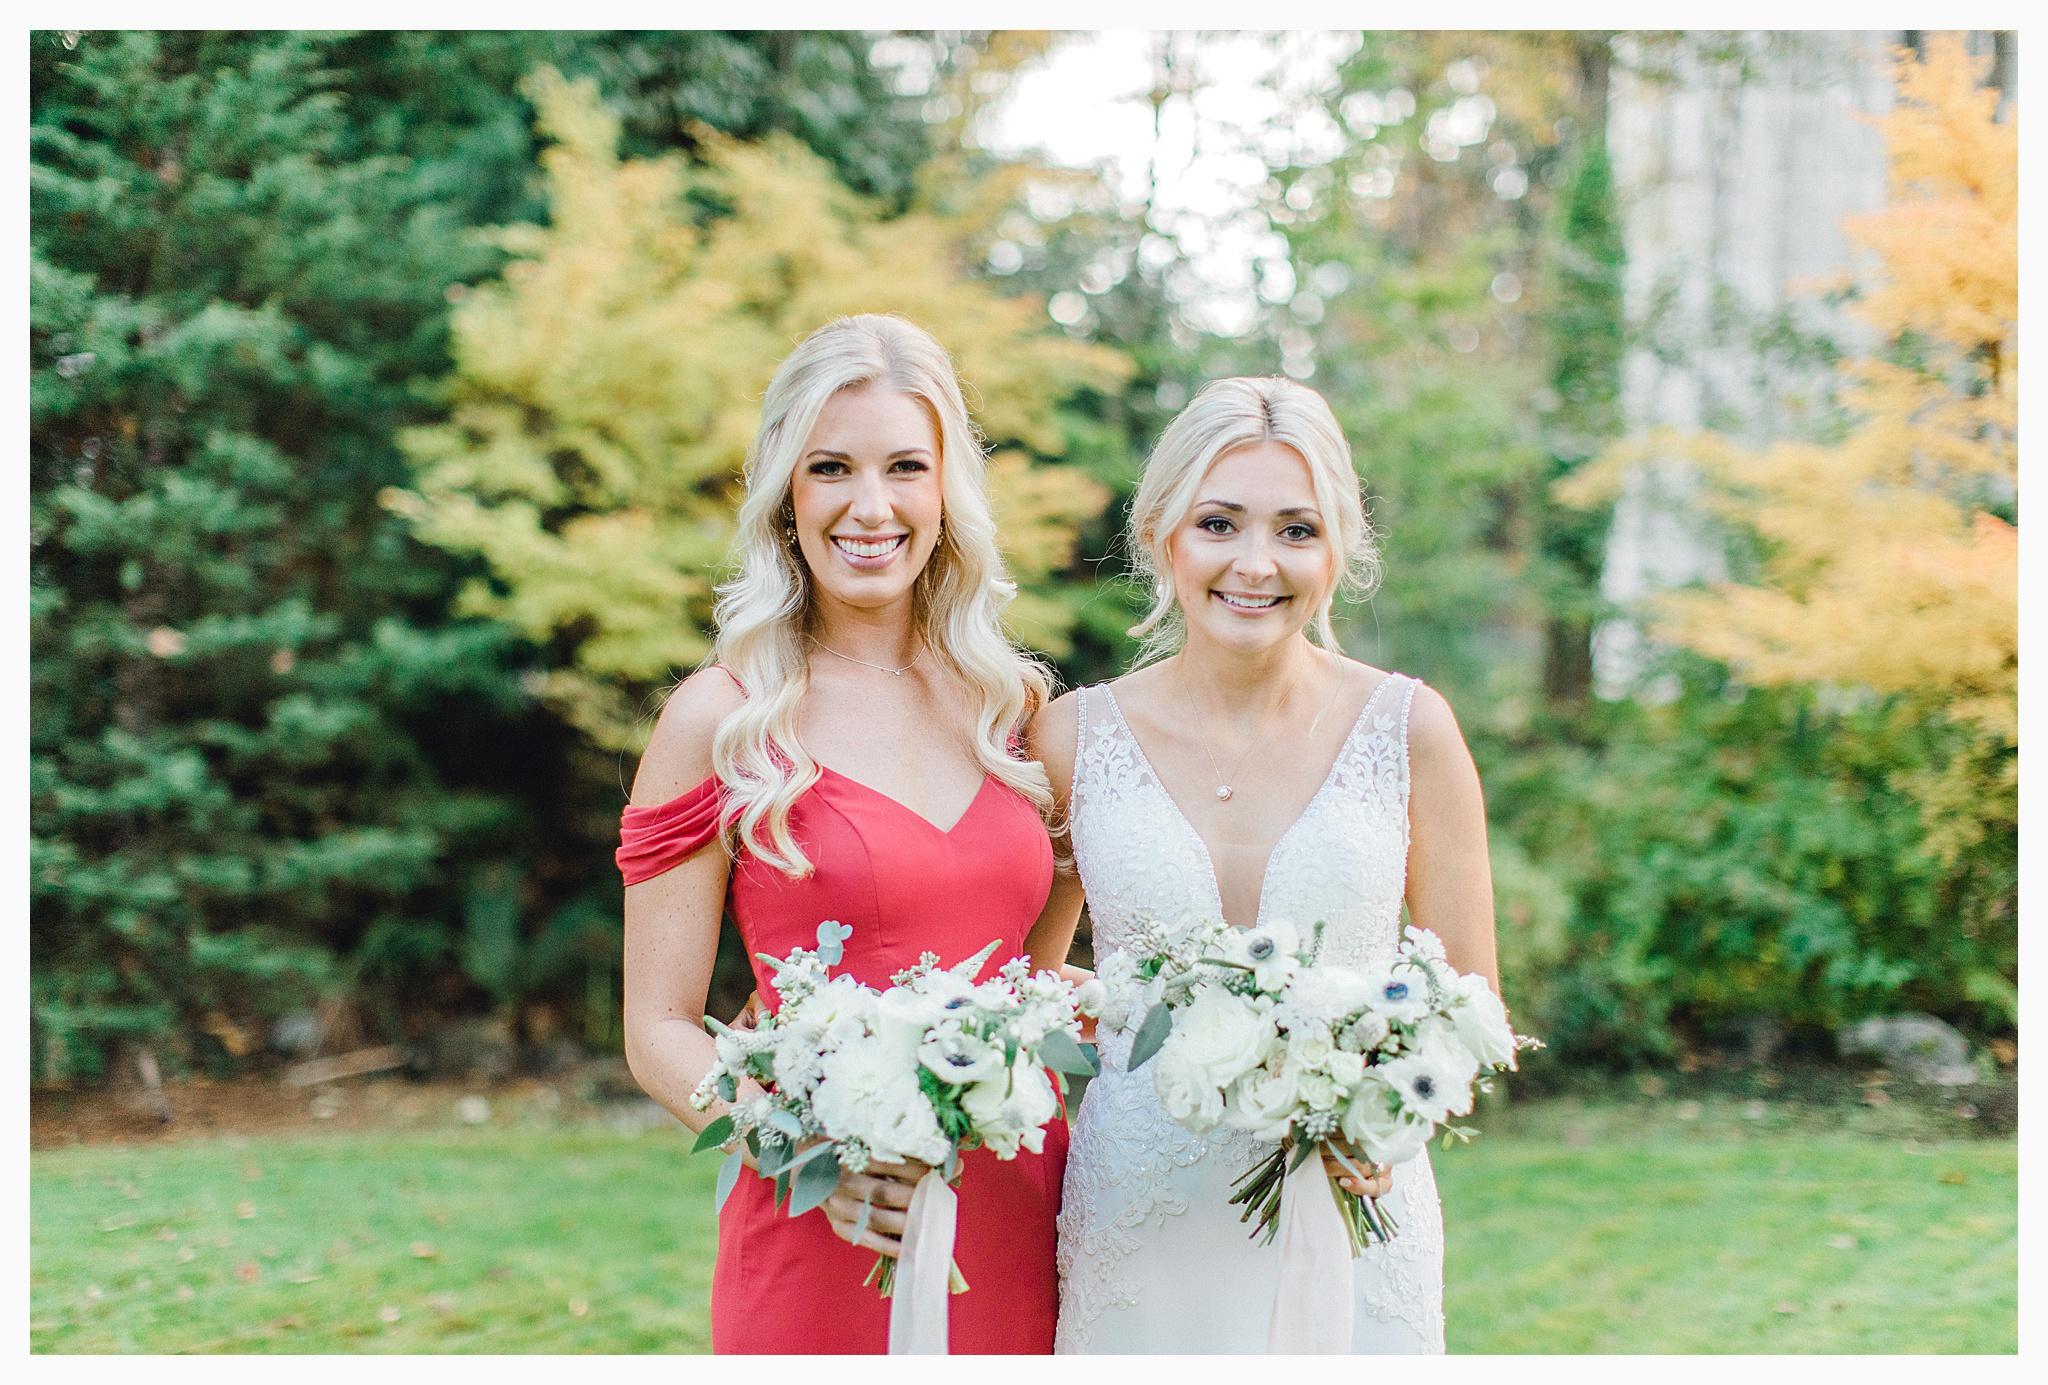 Emma Rose Company Light and Airy Wedding Photographer, Beautiful fall wedding at Rock Creek Gardens Venue in Puyallup, Washington._0045.jpg